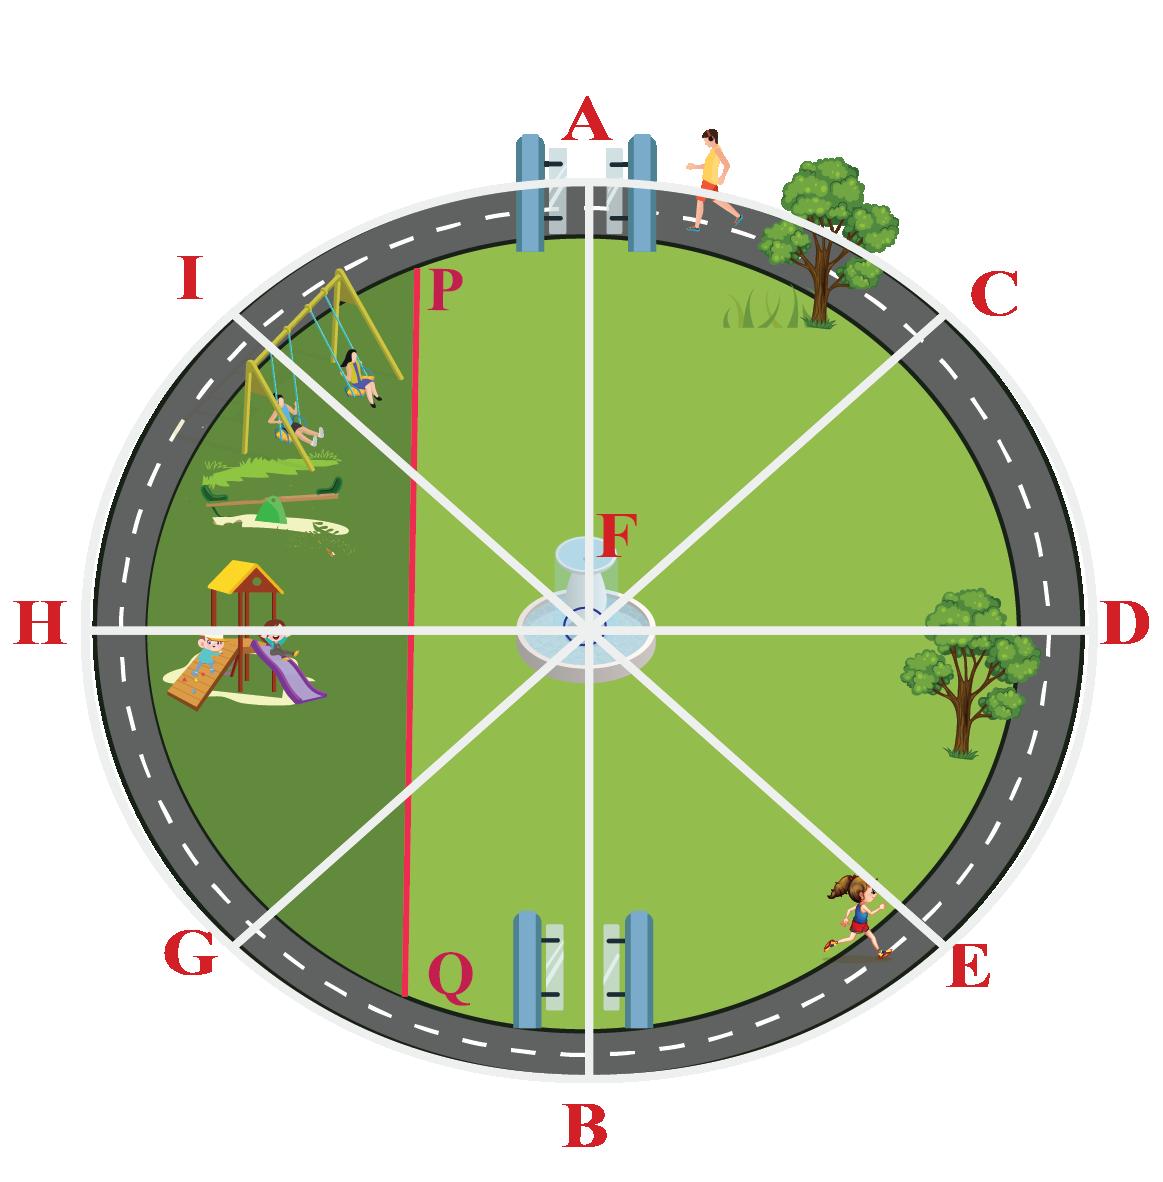 Multiple diameters shown in the park